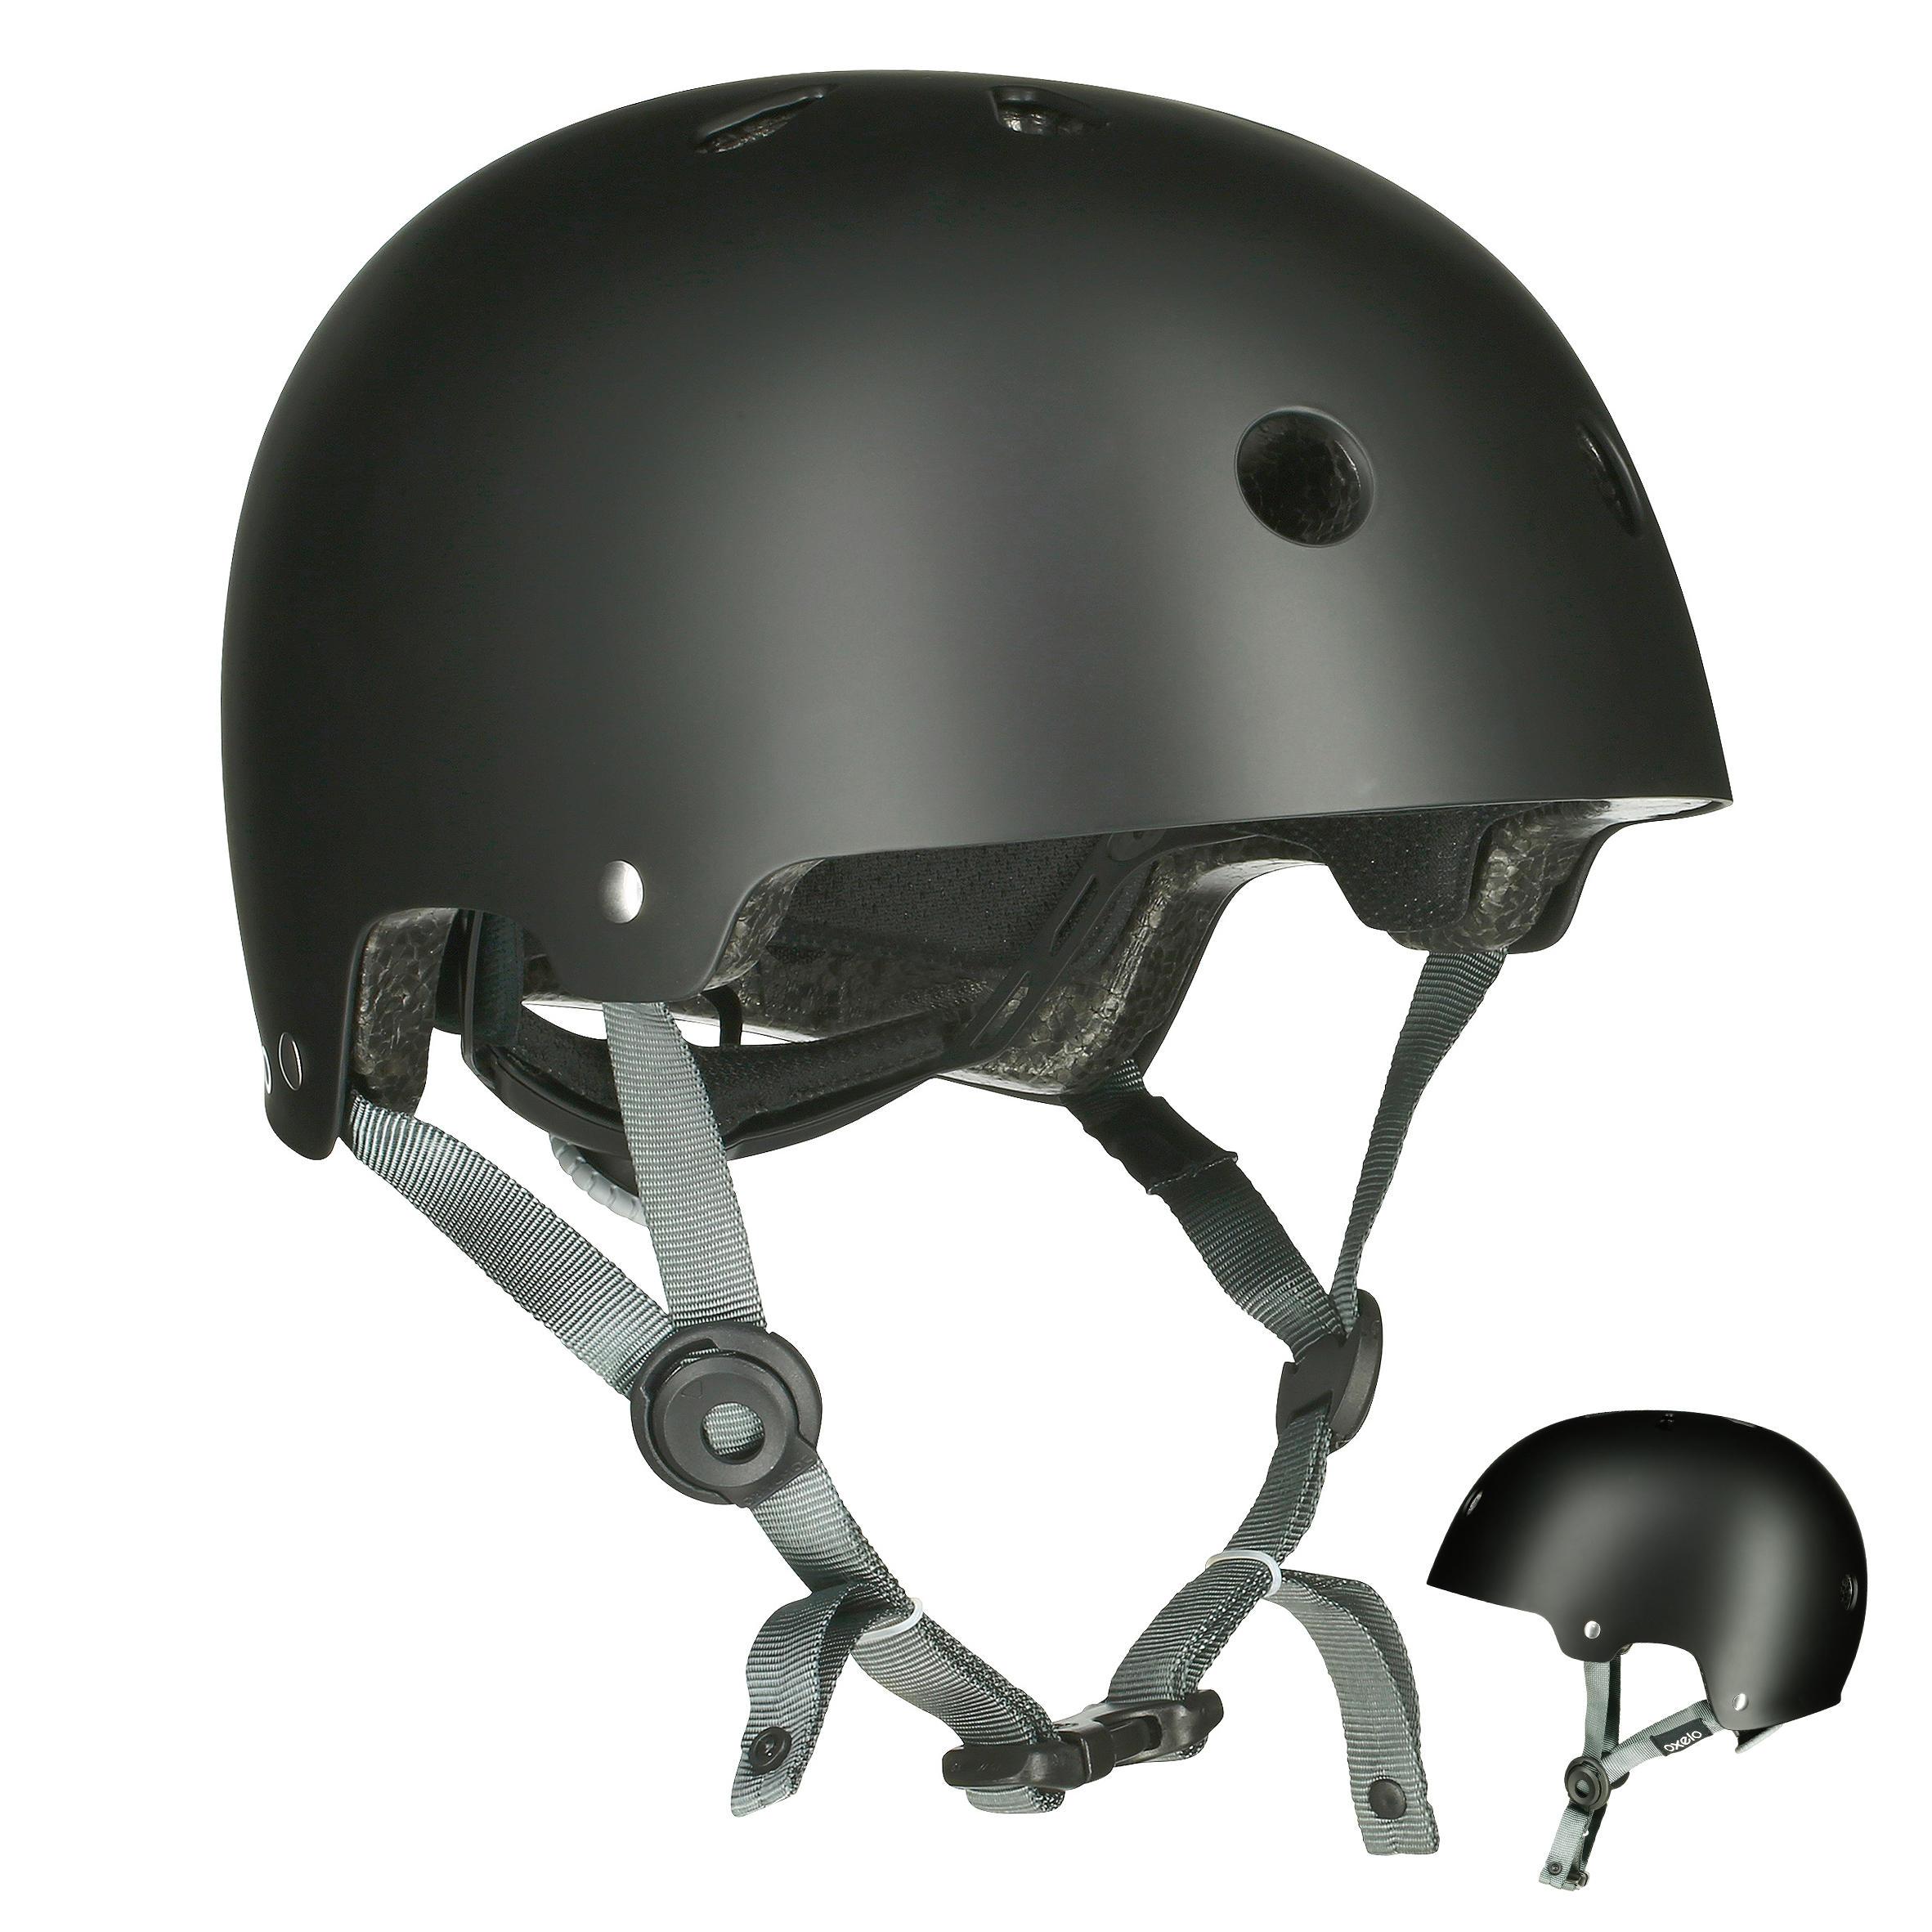 Helm Play 5 voor skaten skateboarden steppen fietsen L